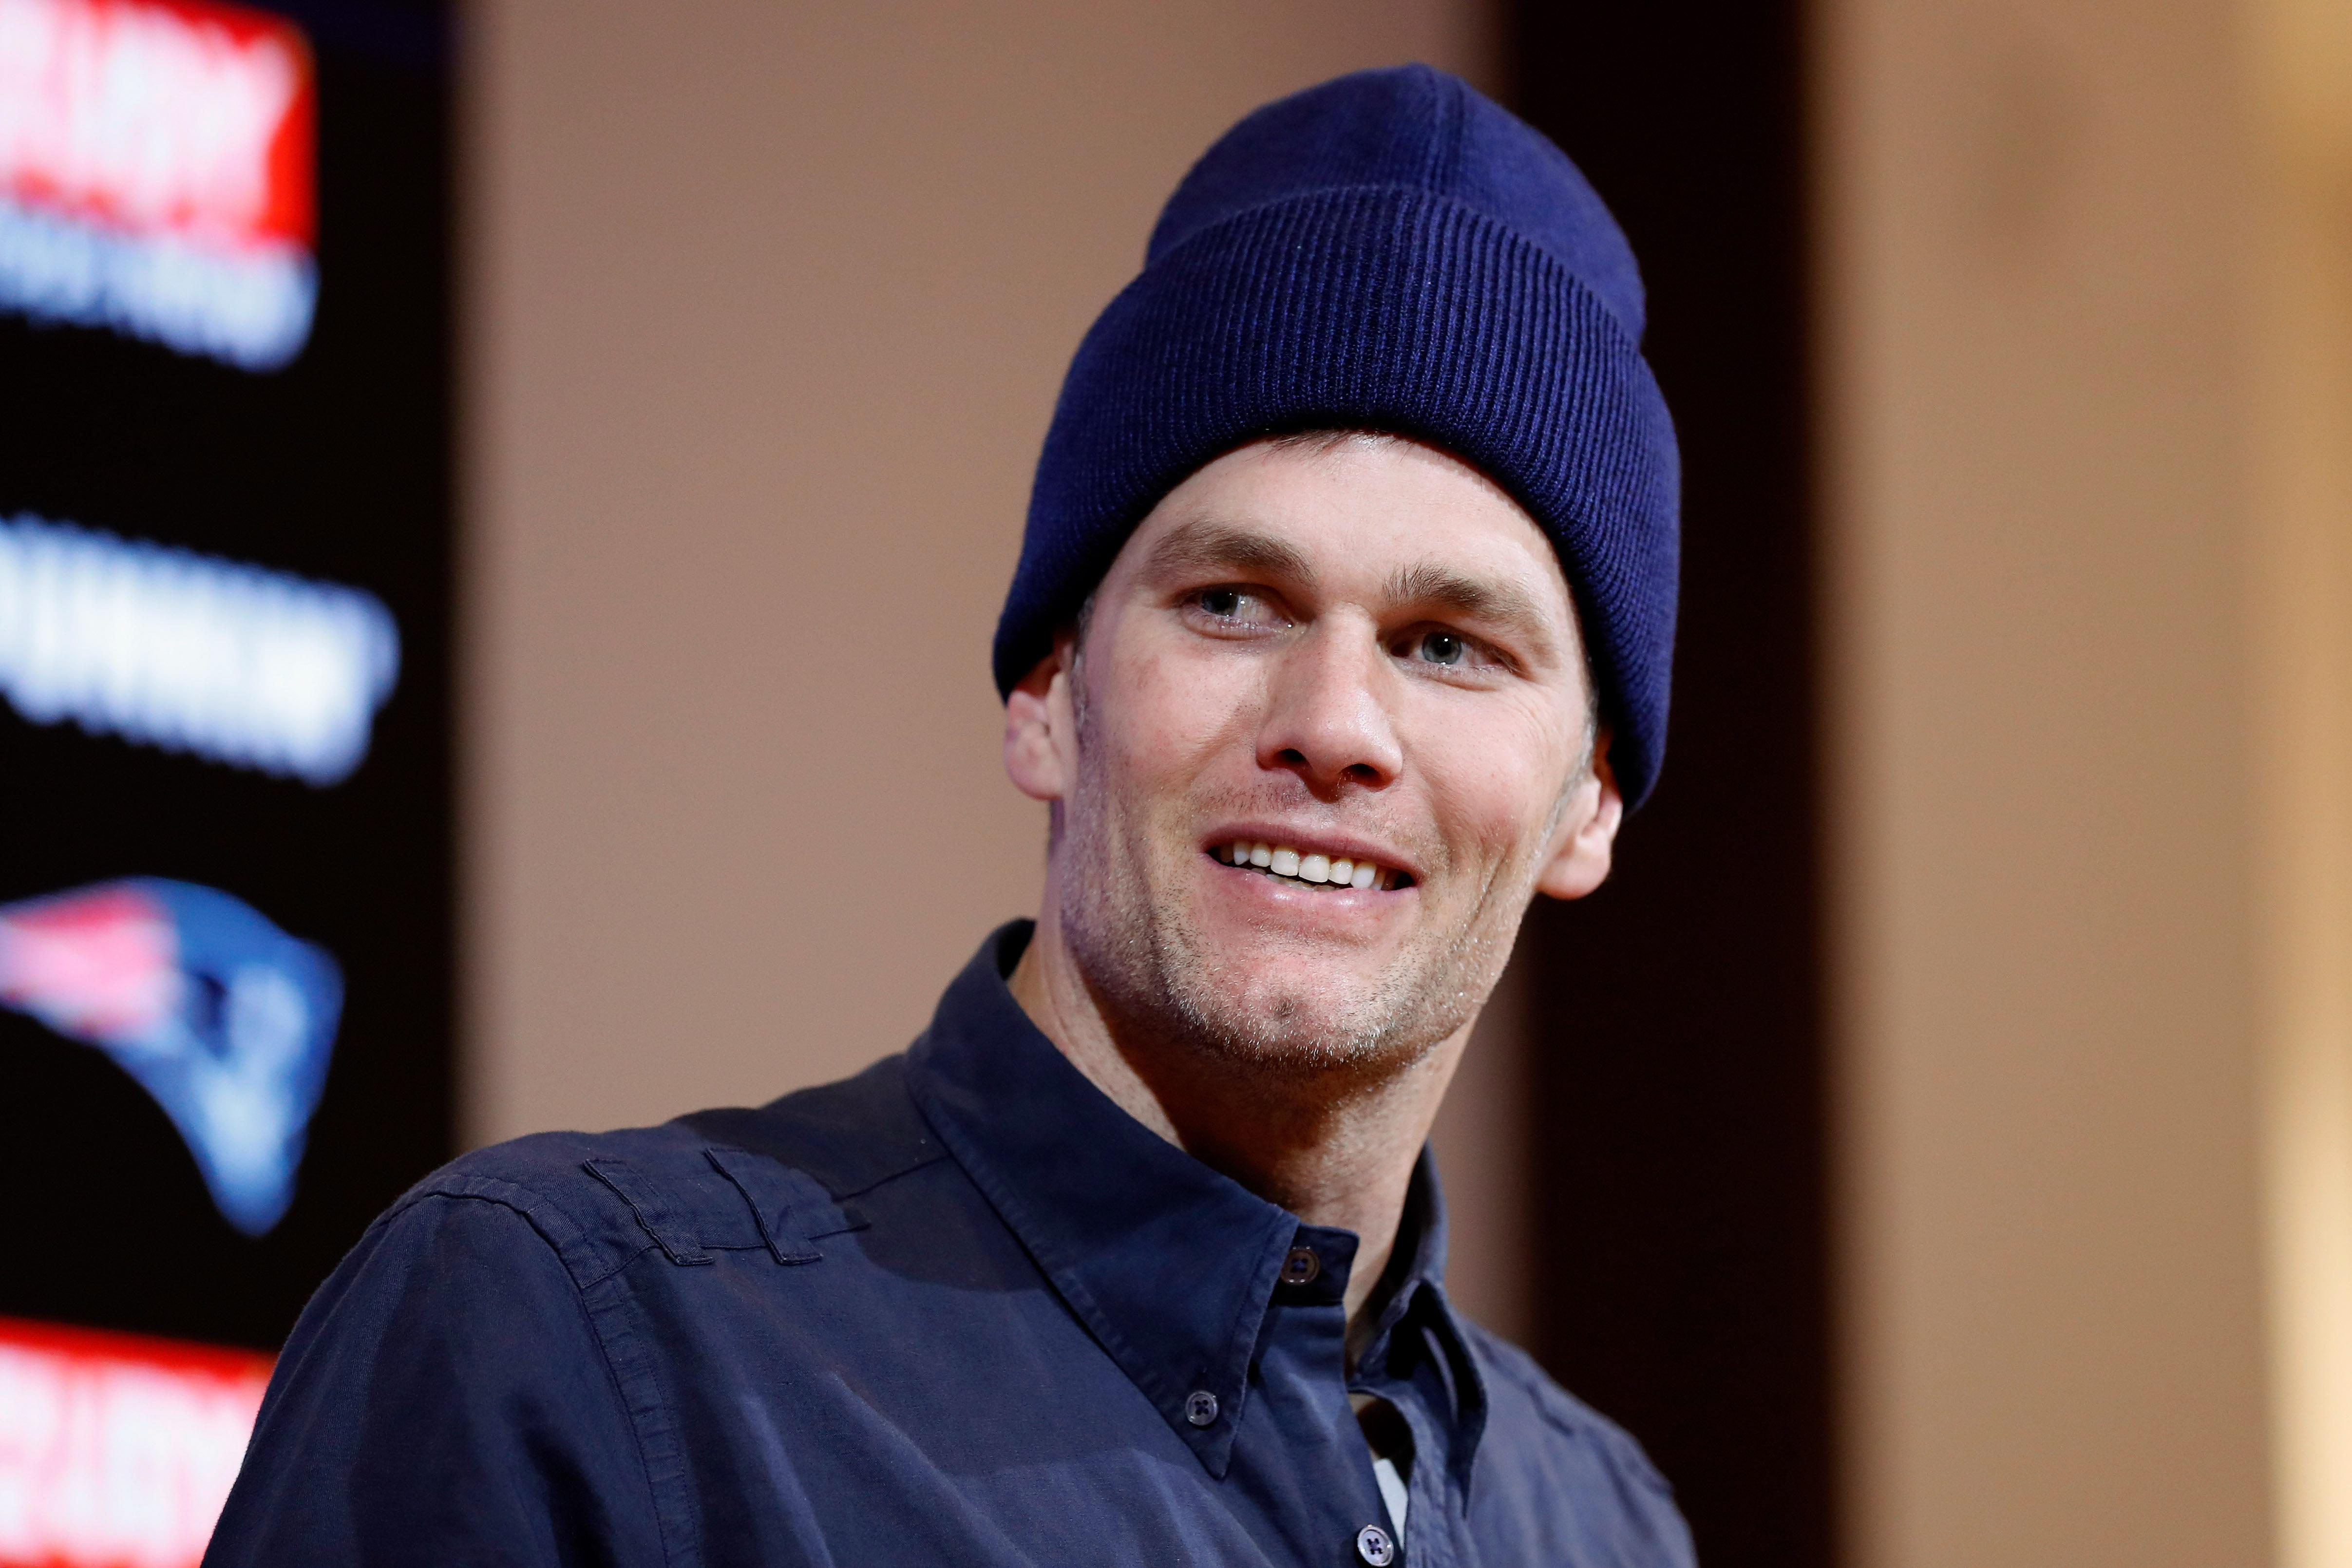 NFL Rumors: Raiders Are Prepared to Offer Tom Brady $30 Million Per Year